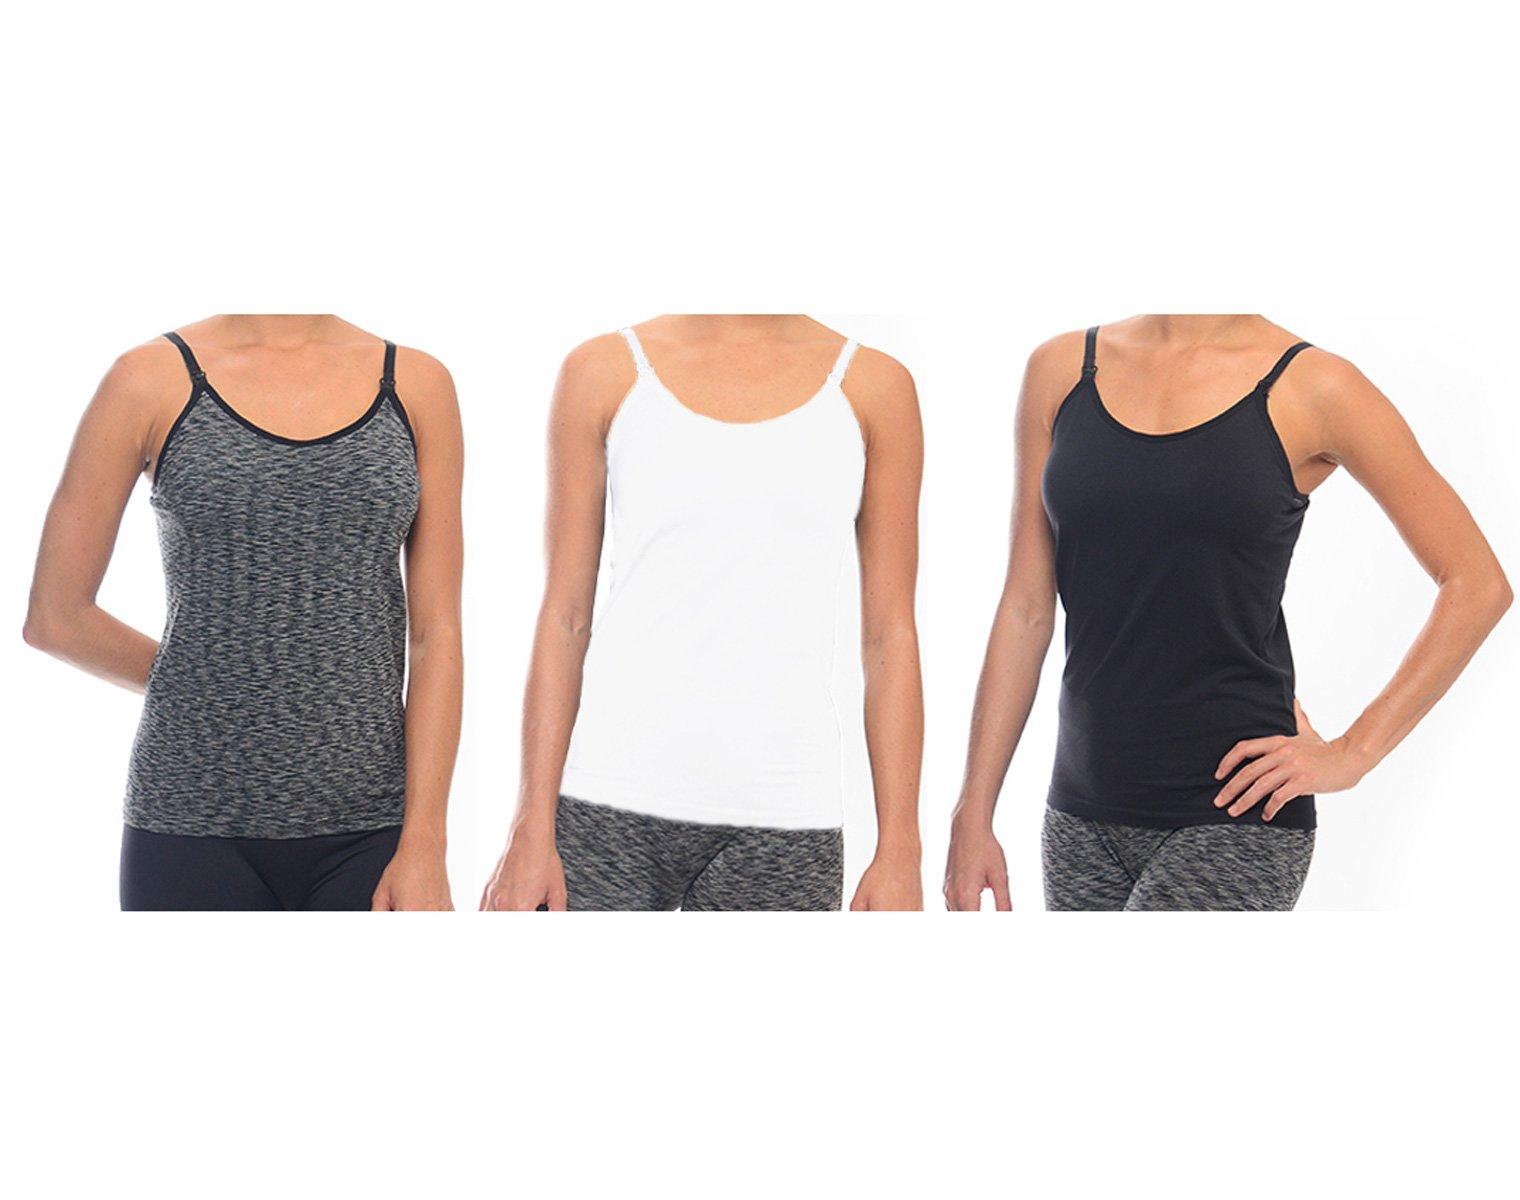 31e3dbe67c890 Get Quotations · SUIEK Nursing Tops Tank Shirt Cami Sleep Bra For Maternity  and Breastfeeding 3PCS/Pack